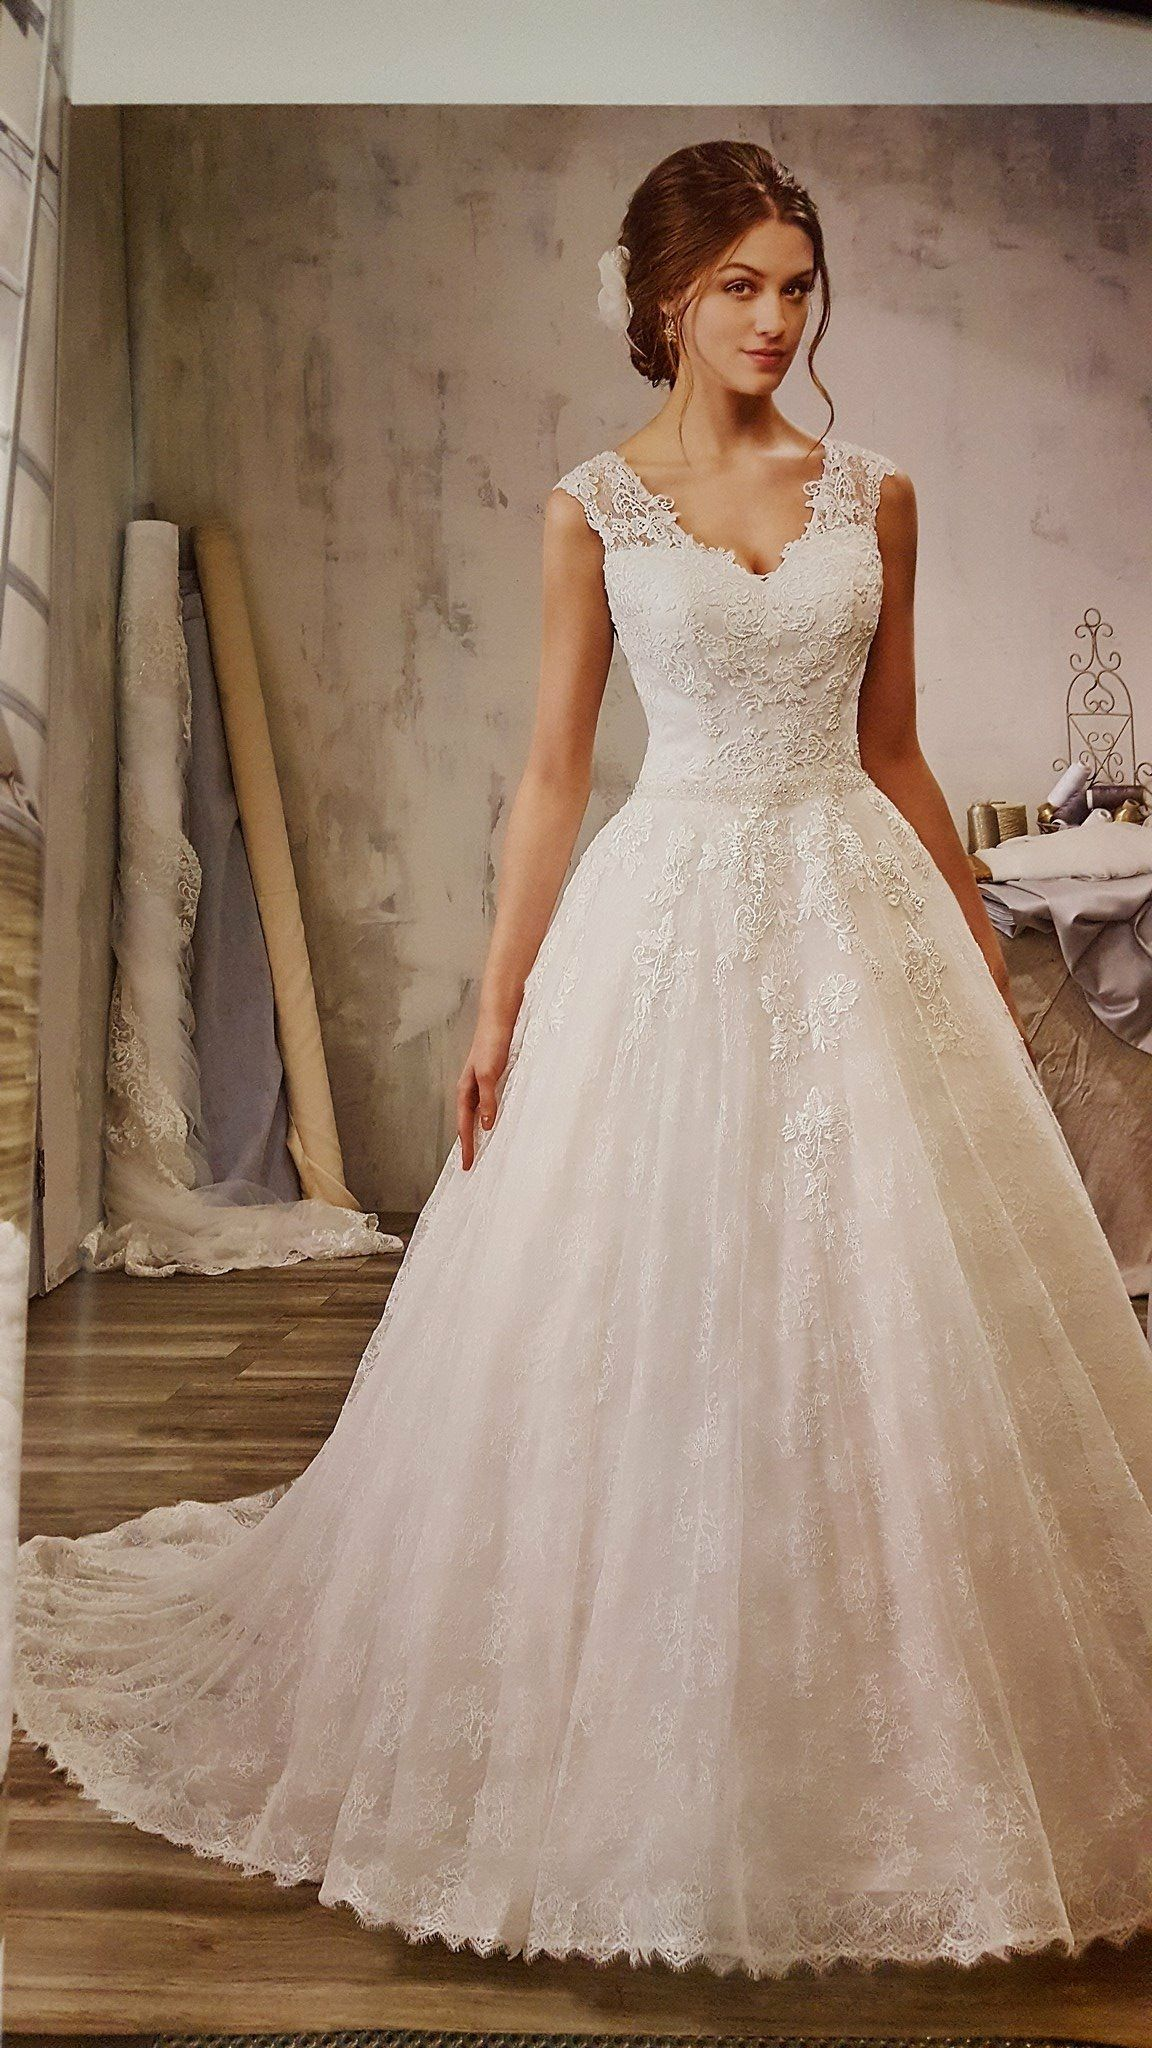 Pin by Diana on Wedding Sleeveless wedding dress